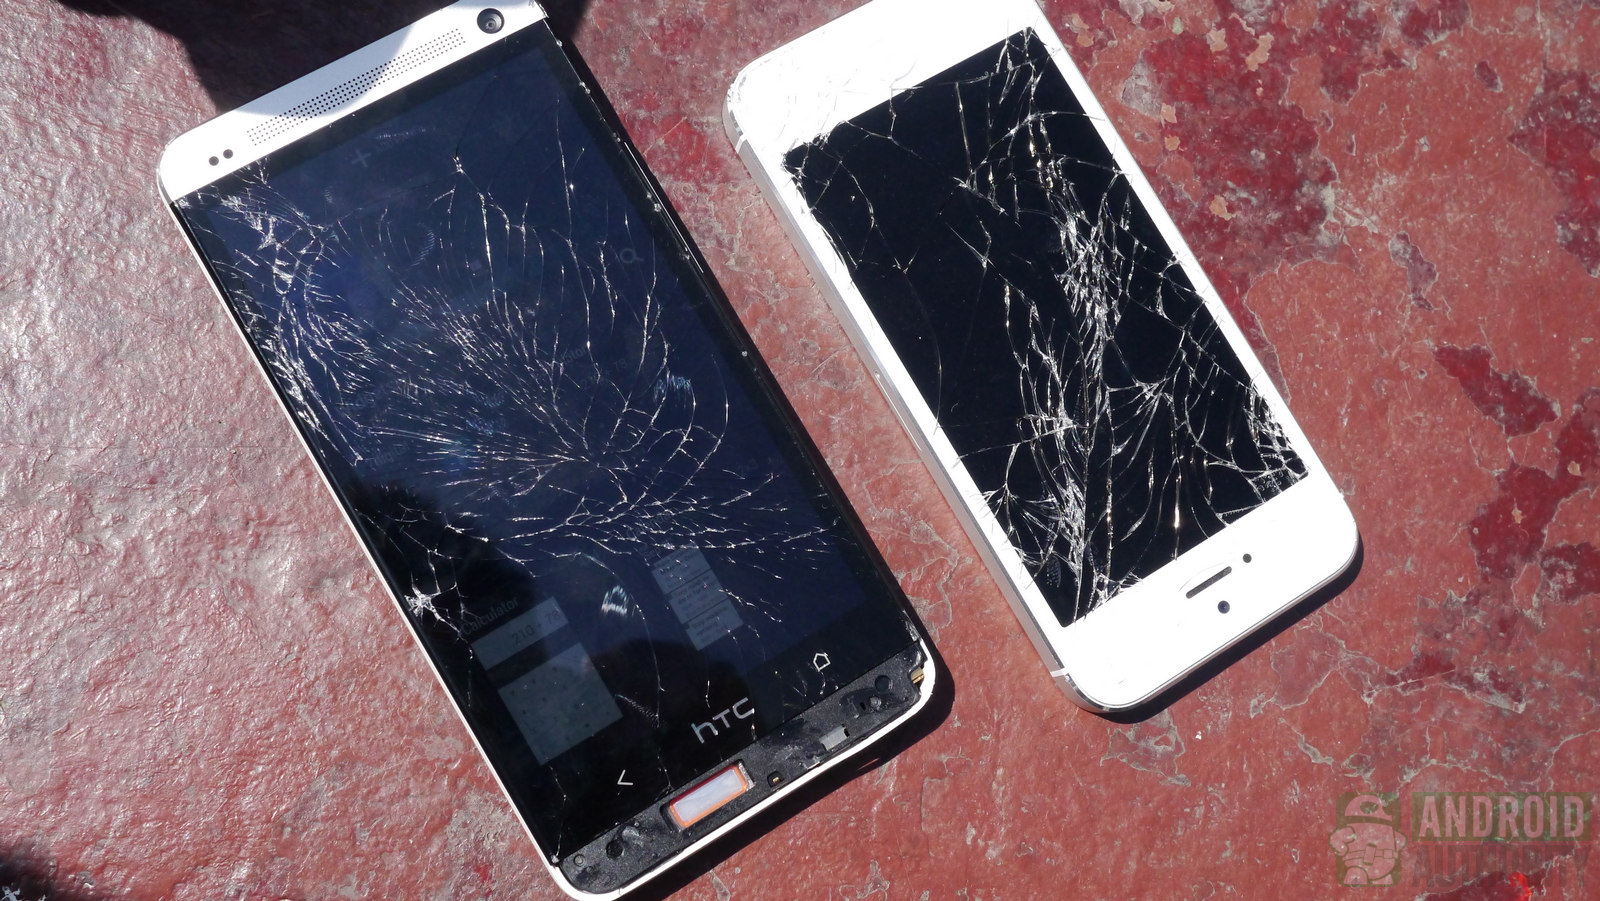 HTC One vs iPhone 5: Smartphone nào bền hơn? 1